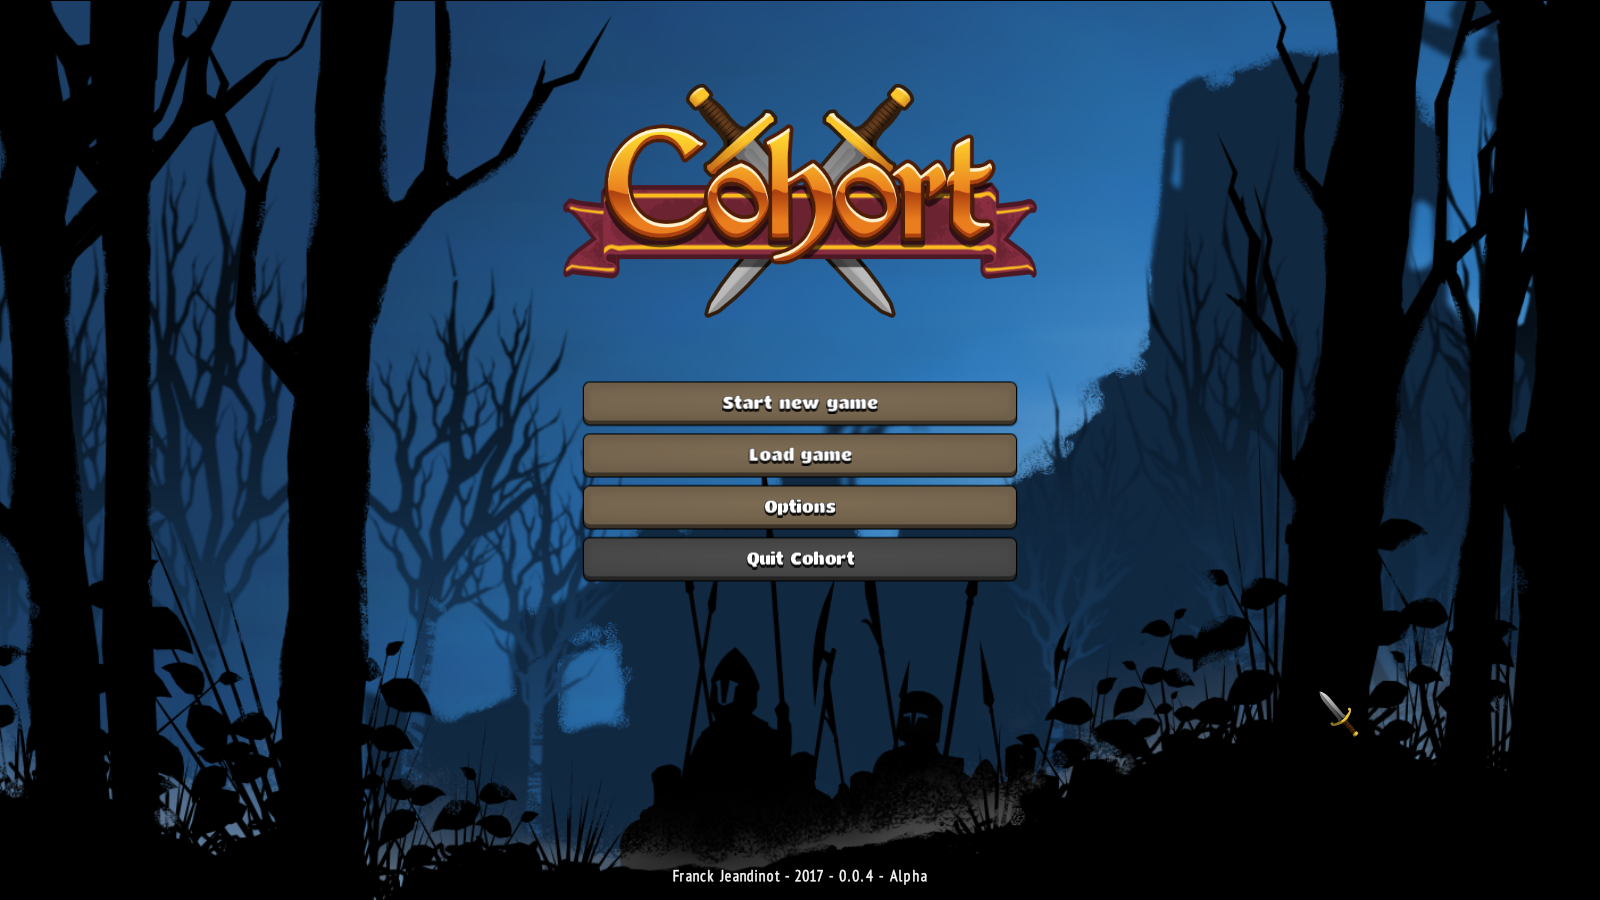 The new menu screen